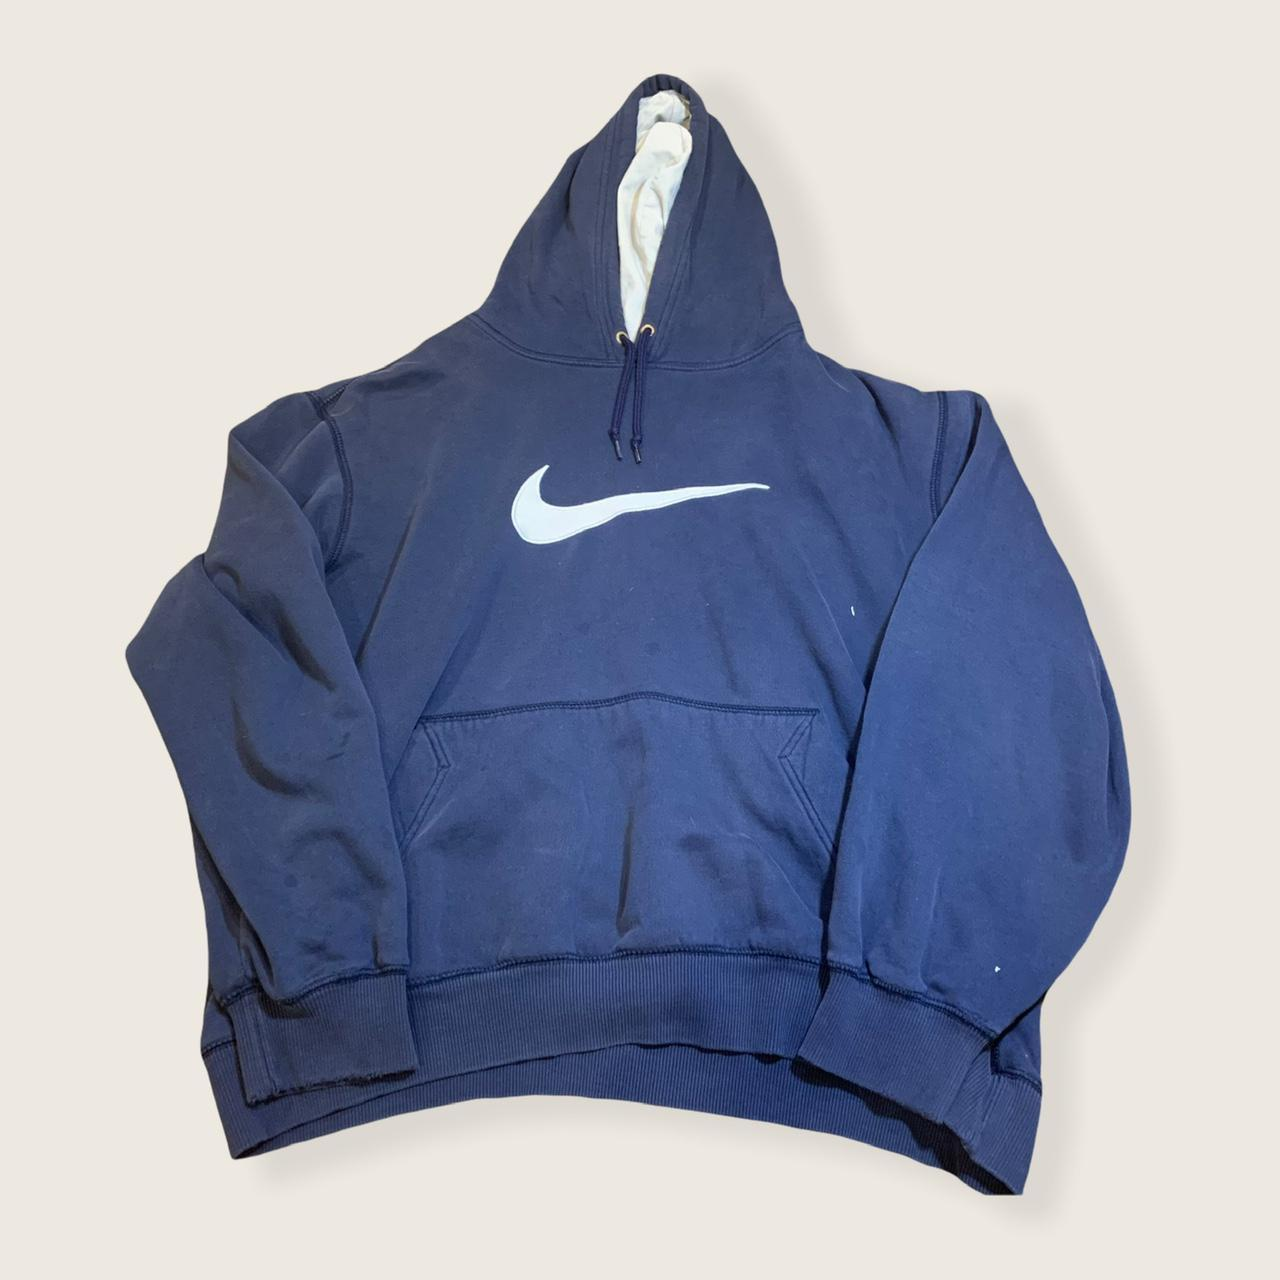 Product Image 1 - Vintage Y2K Navy Blue Nike